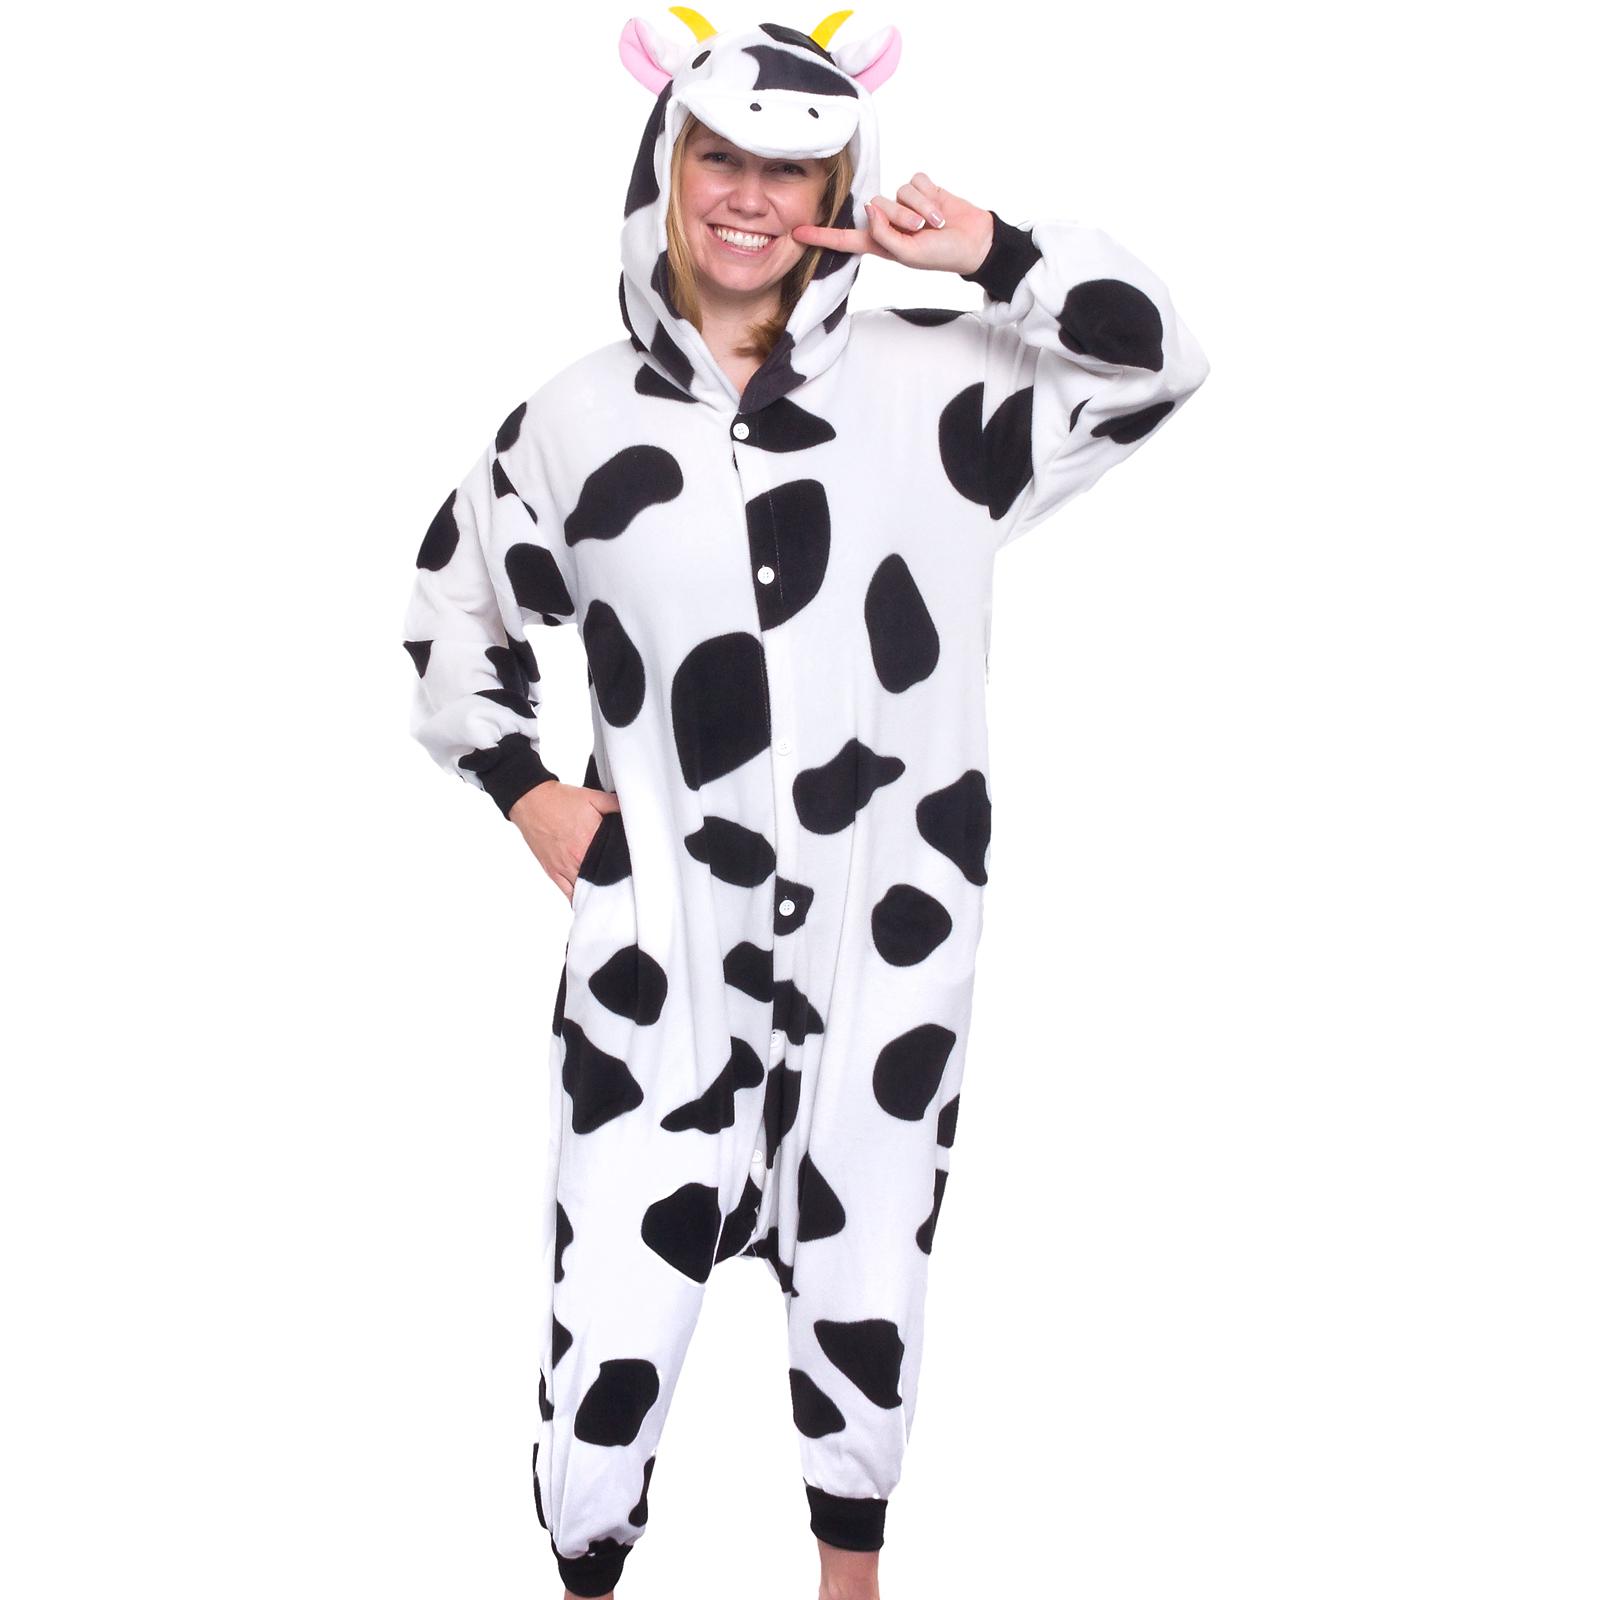 silver lilly unisex adult plush animal cosplay costume pajamas cow walmartcom - Halloween Costume Cow